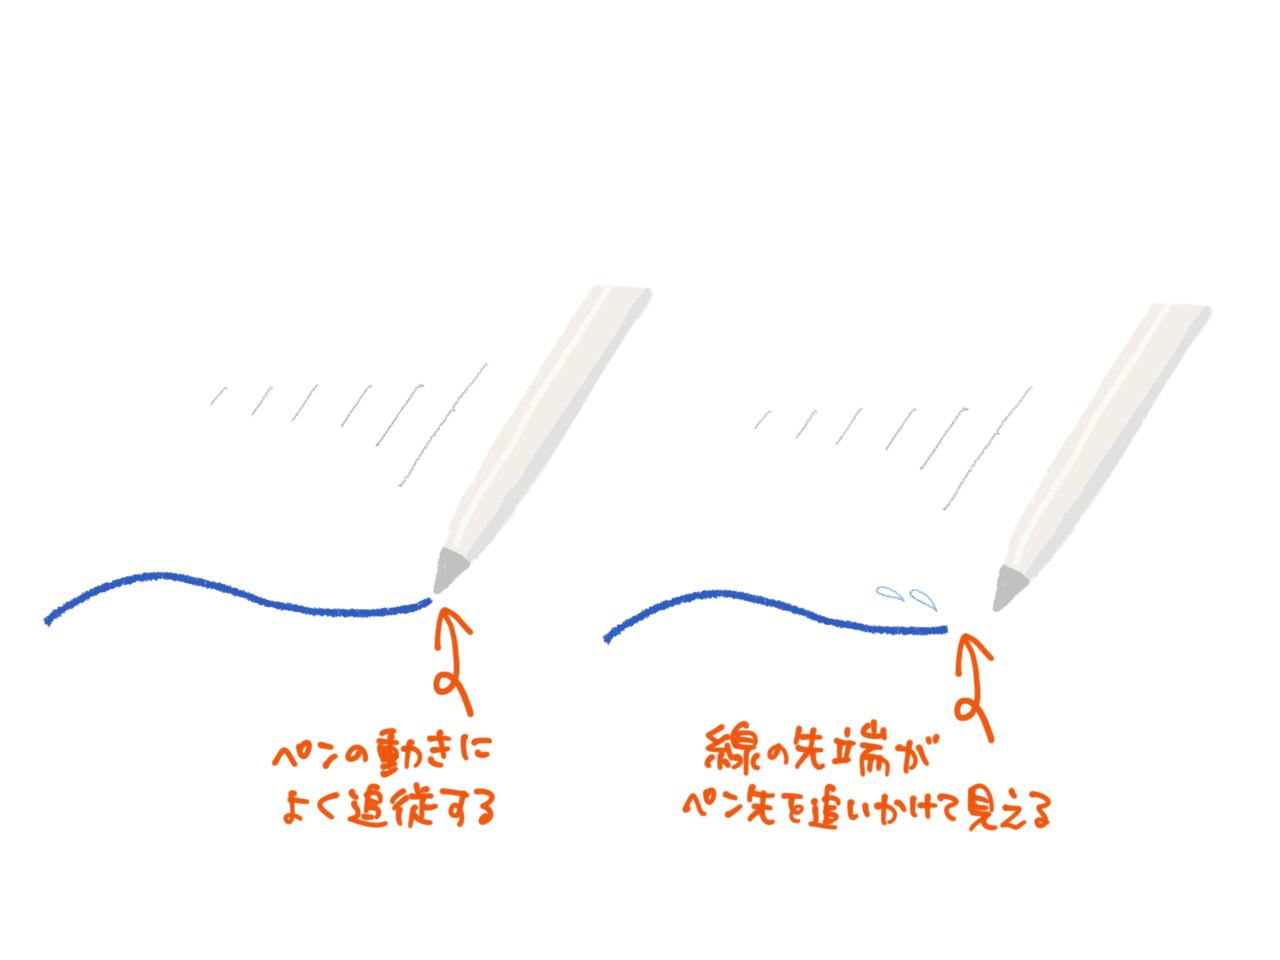 f:id:Imamura:20200419174828p:plain